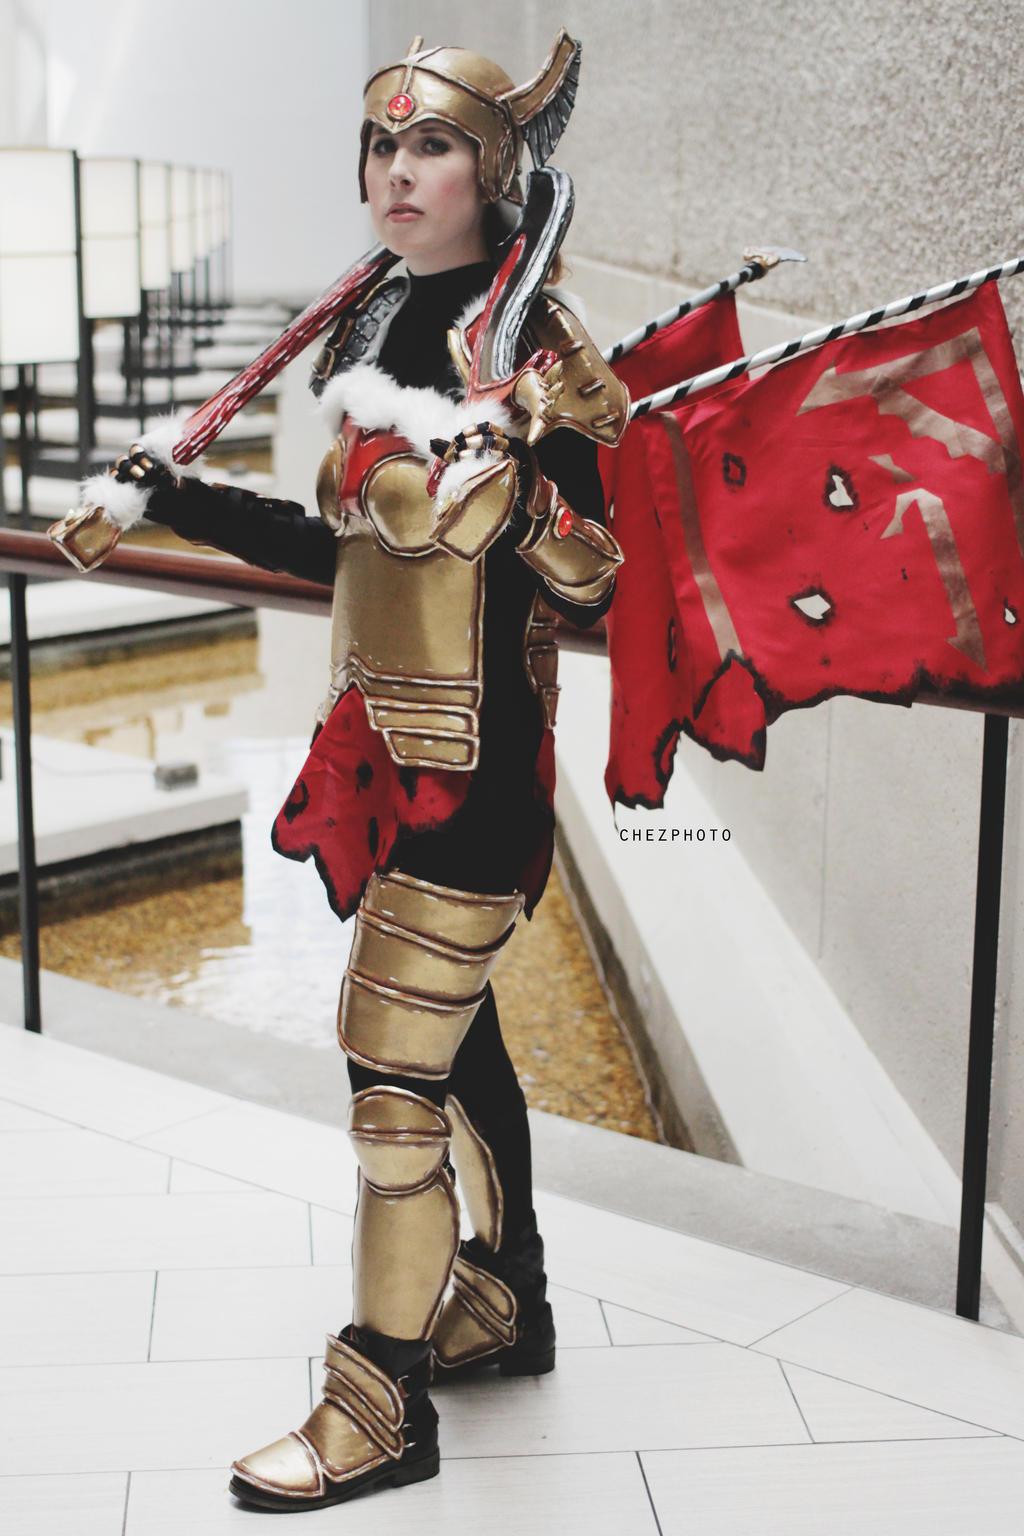 Legion Commander, DOTA 2 by Alanaowlet on DeviantArt